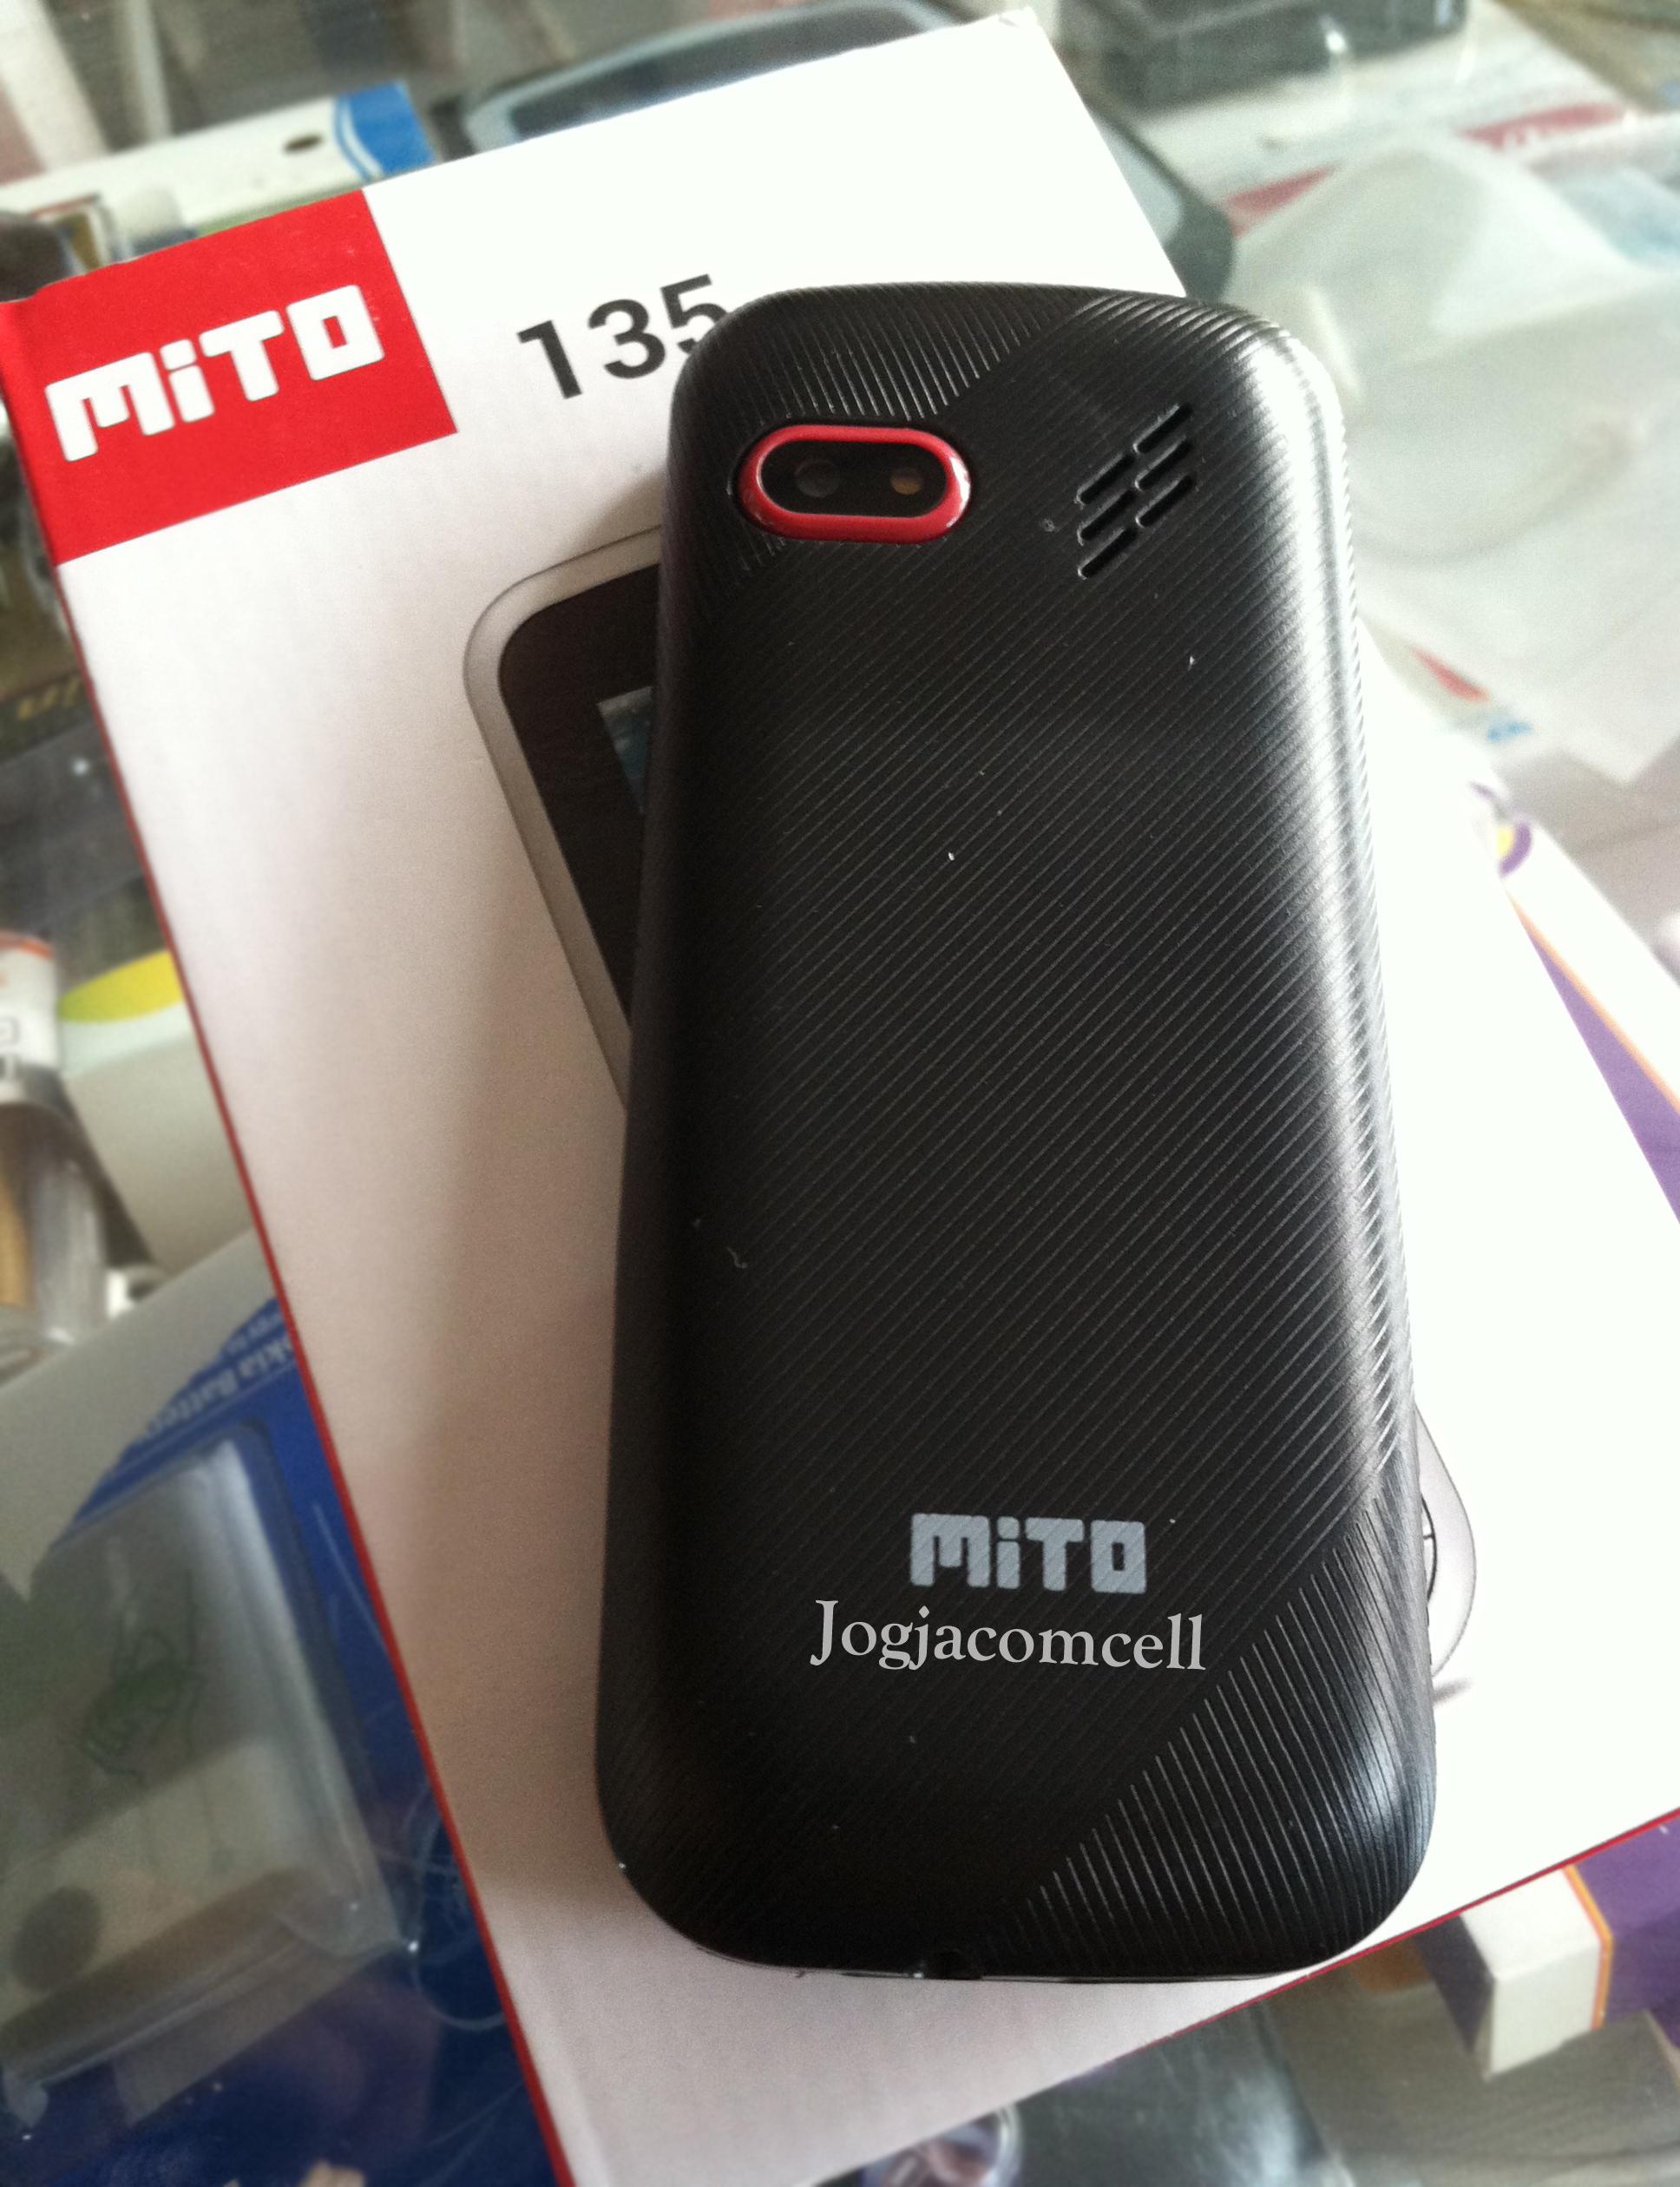 Mito 135 Handphone Hitam7 Daftar Harga Terkini Dan Terlengkap Fantasy A99 Android Jellybean 177 Inch Camera With Flash